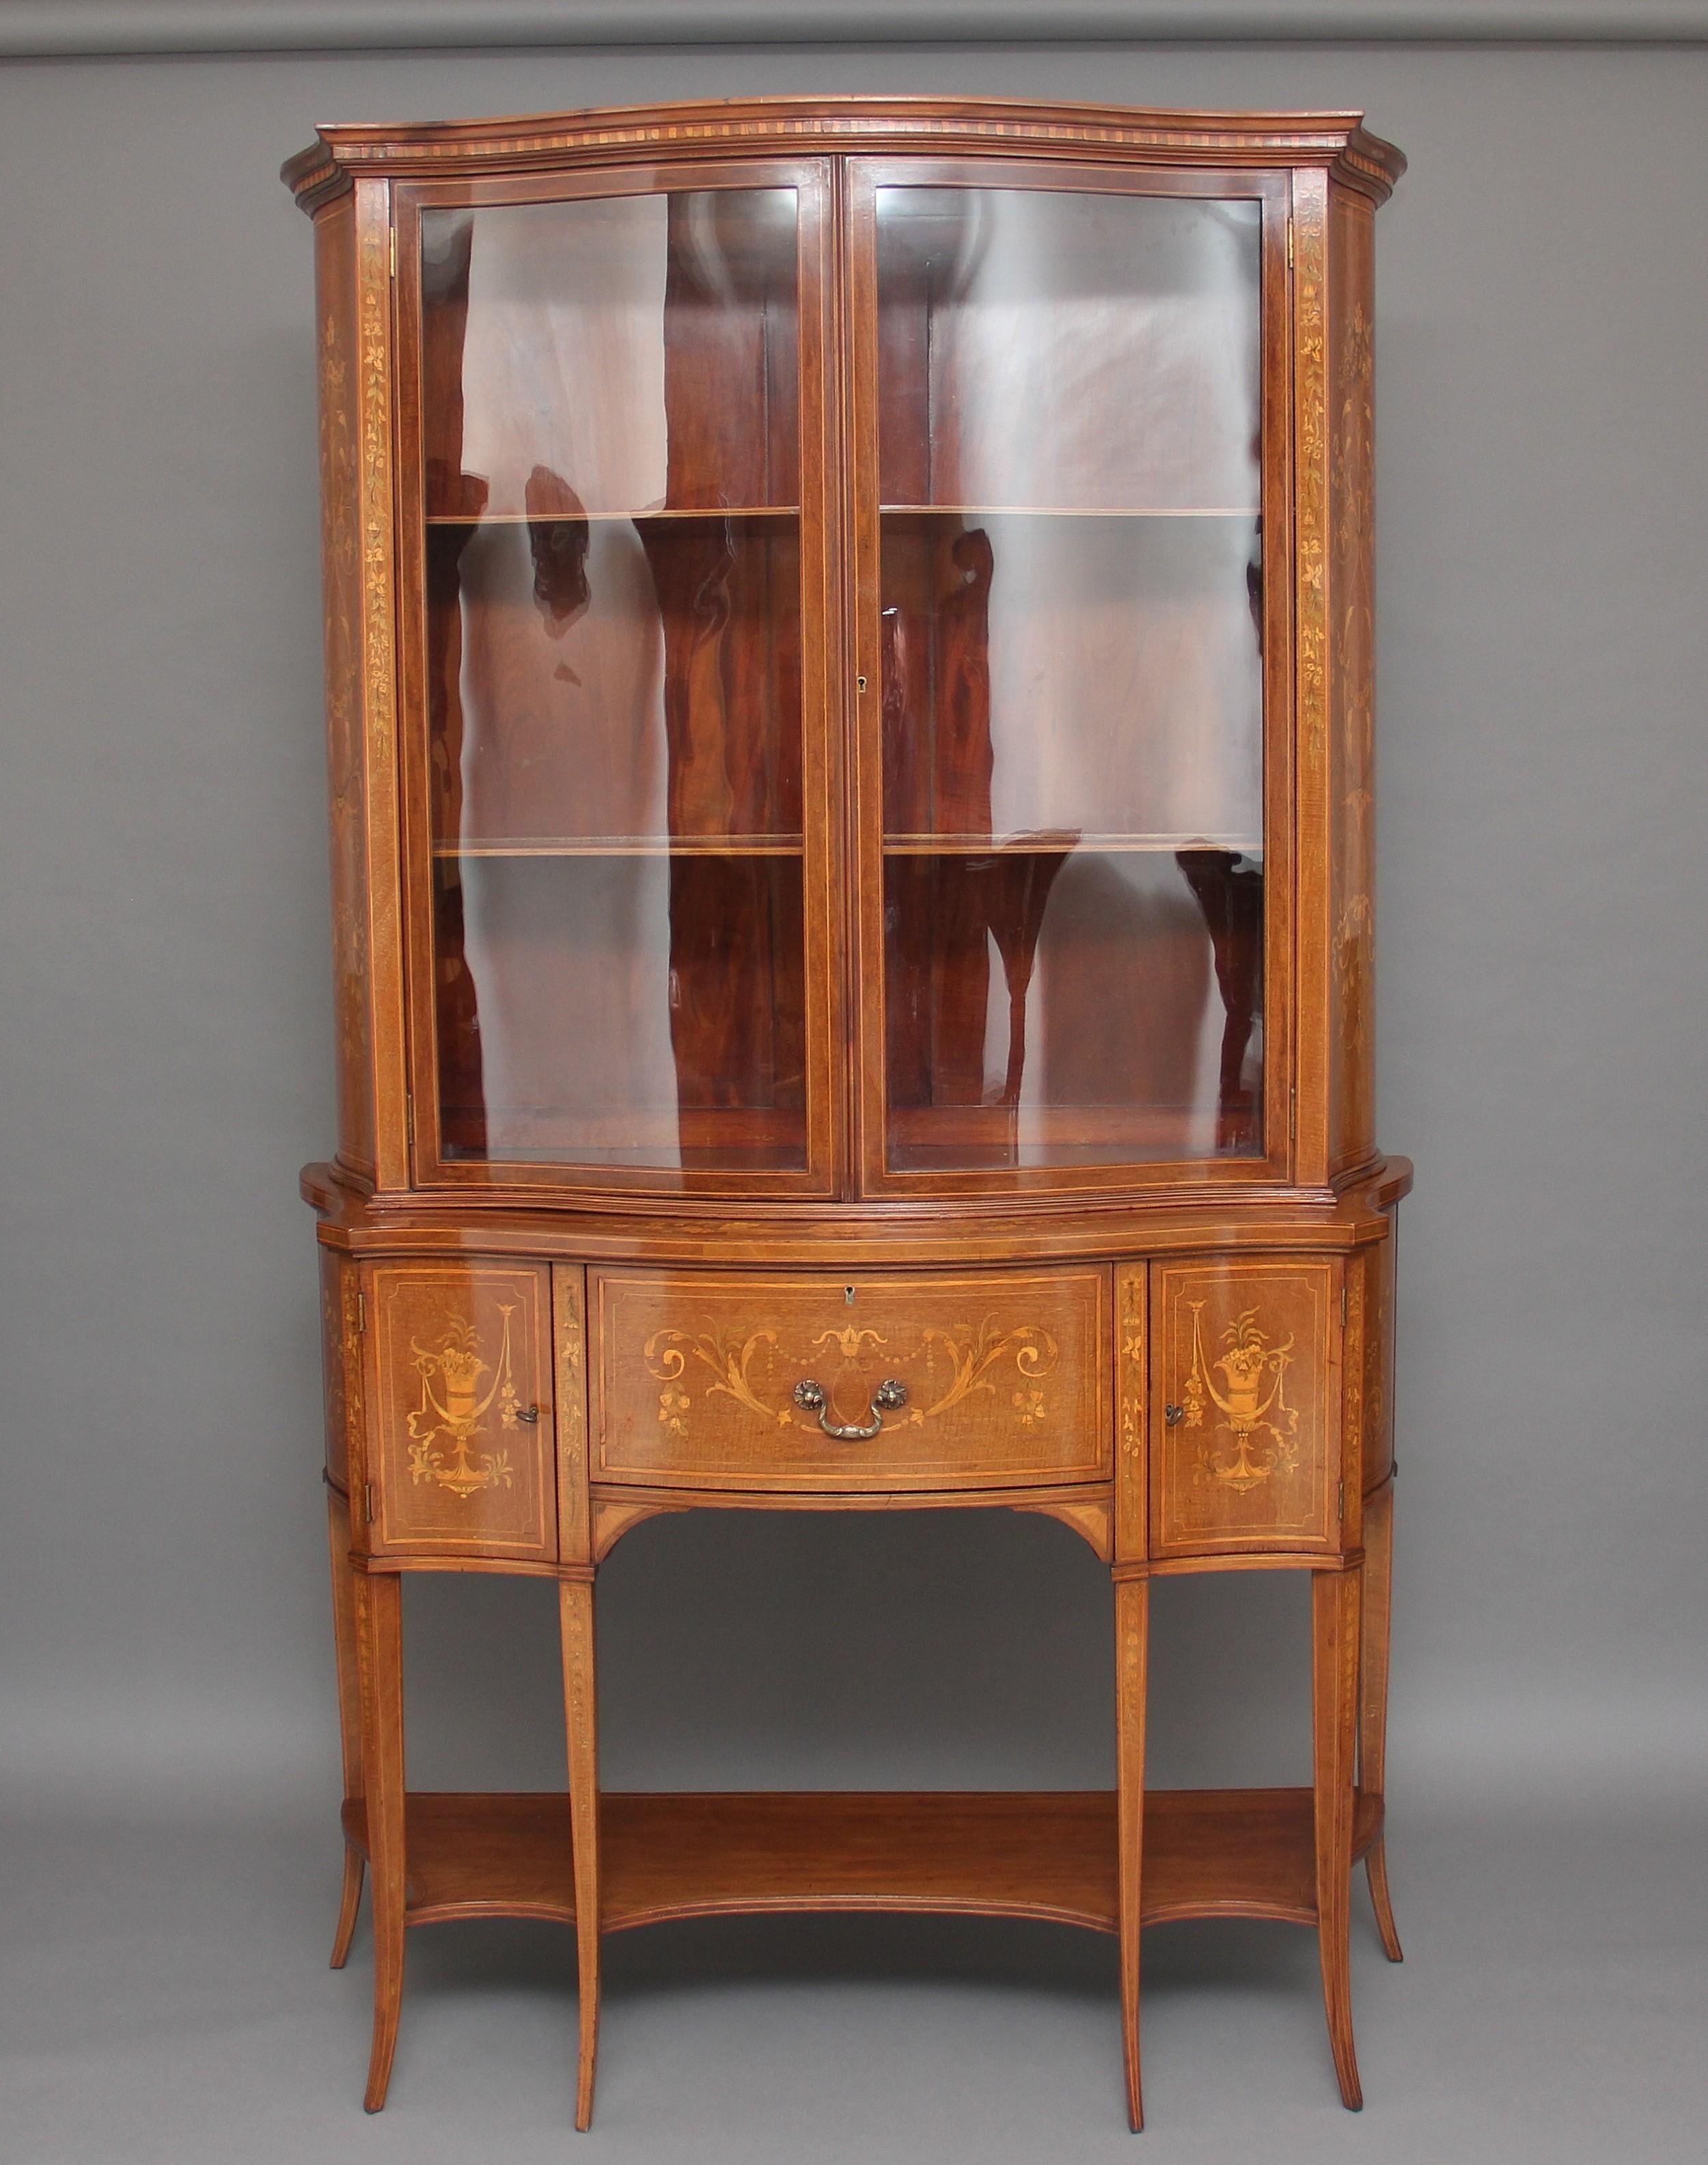 19th century mahogany inlaid display cabinet